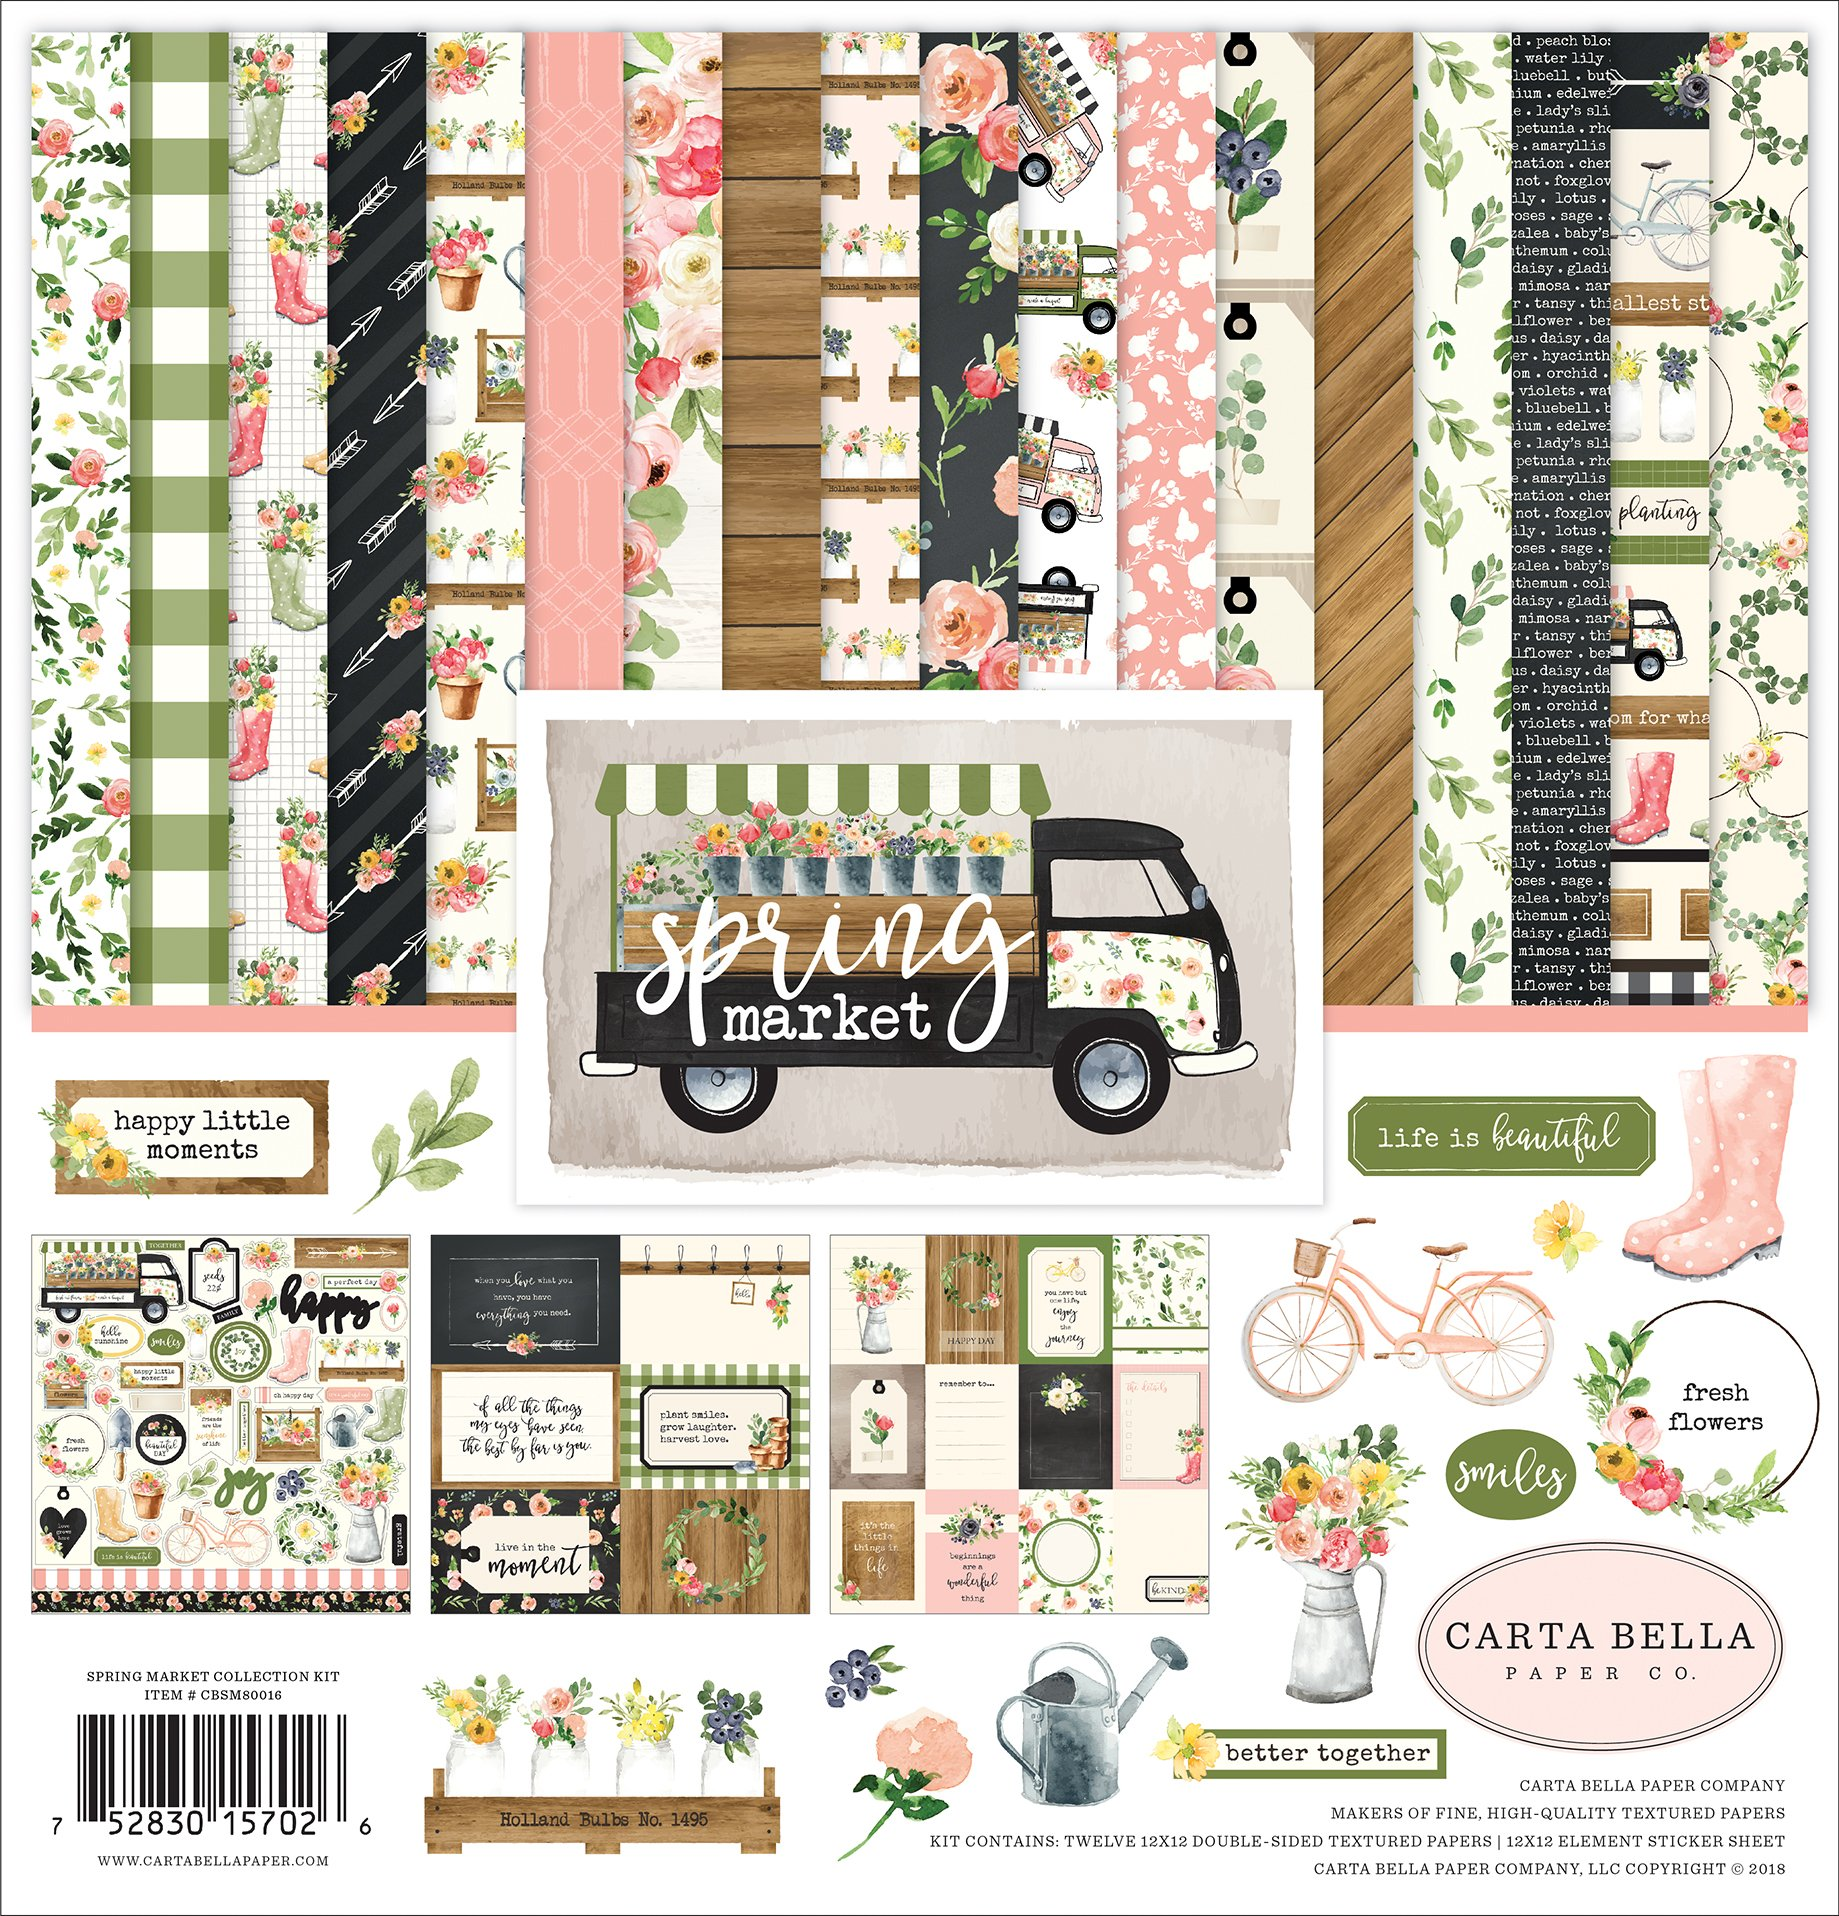 Carta Bella Paper Company Spring Market Collection Kit